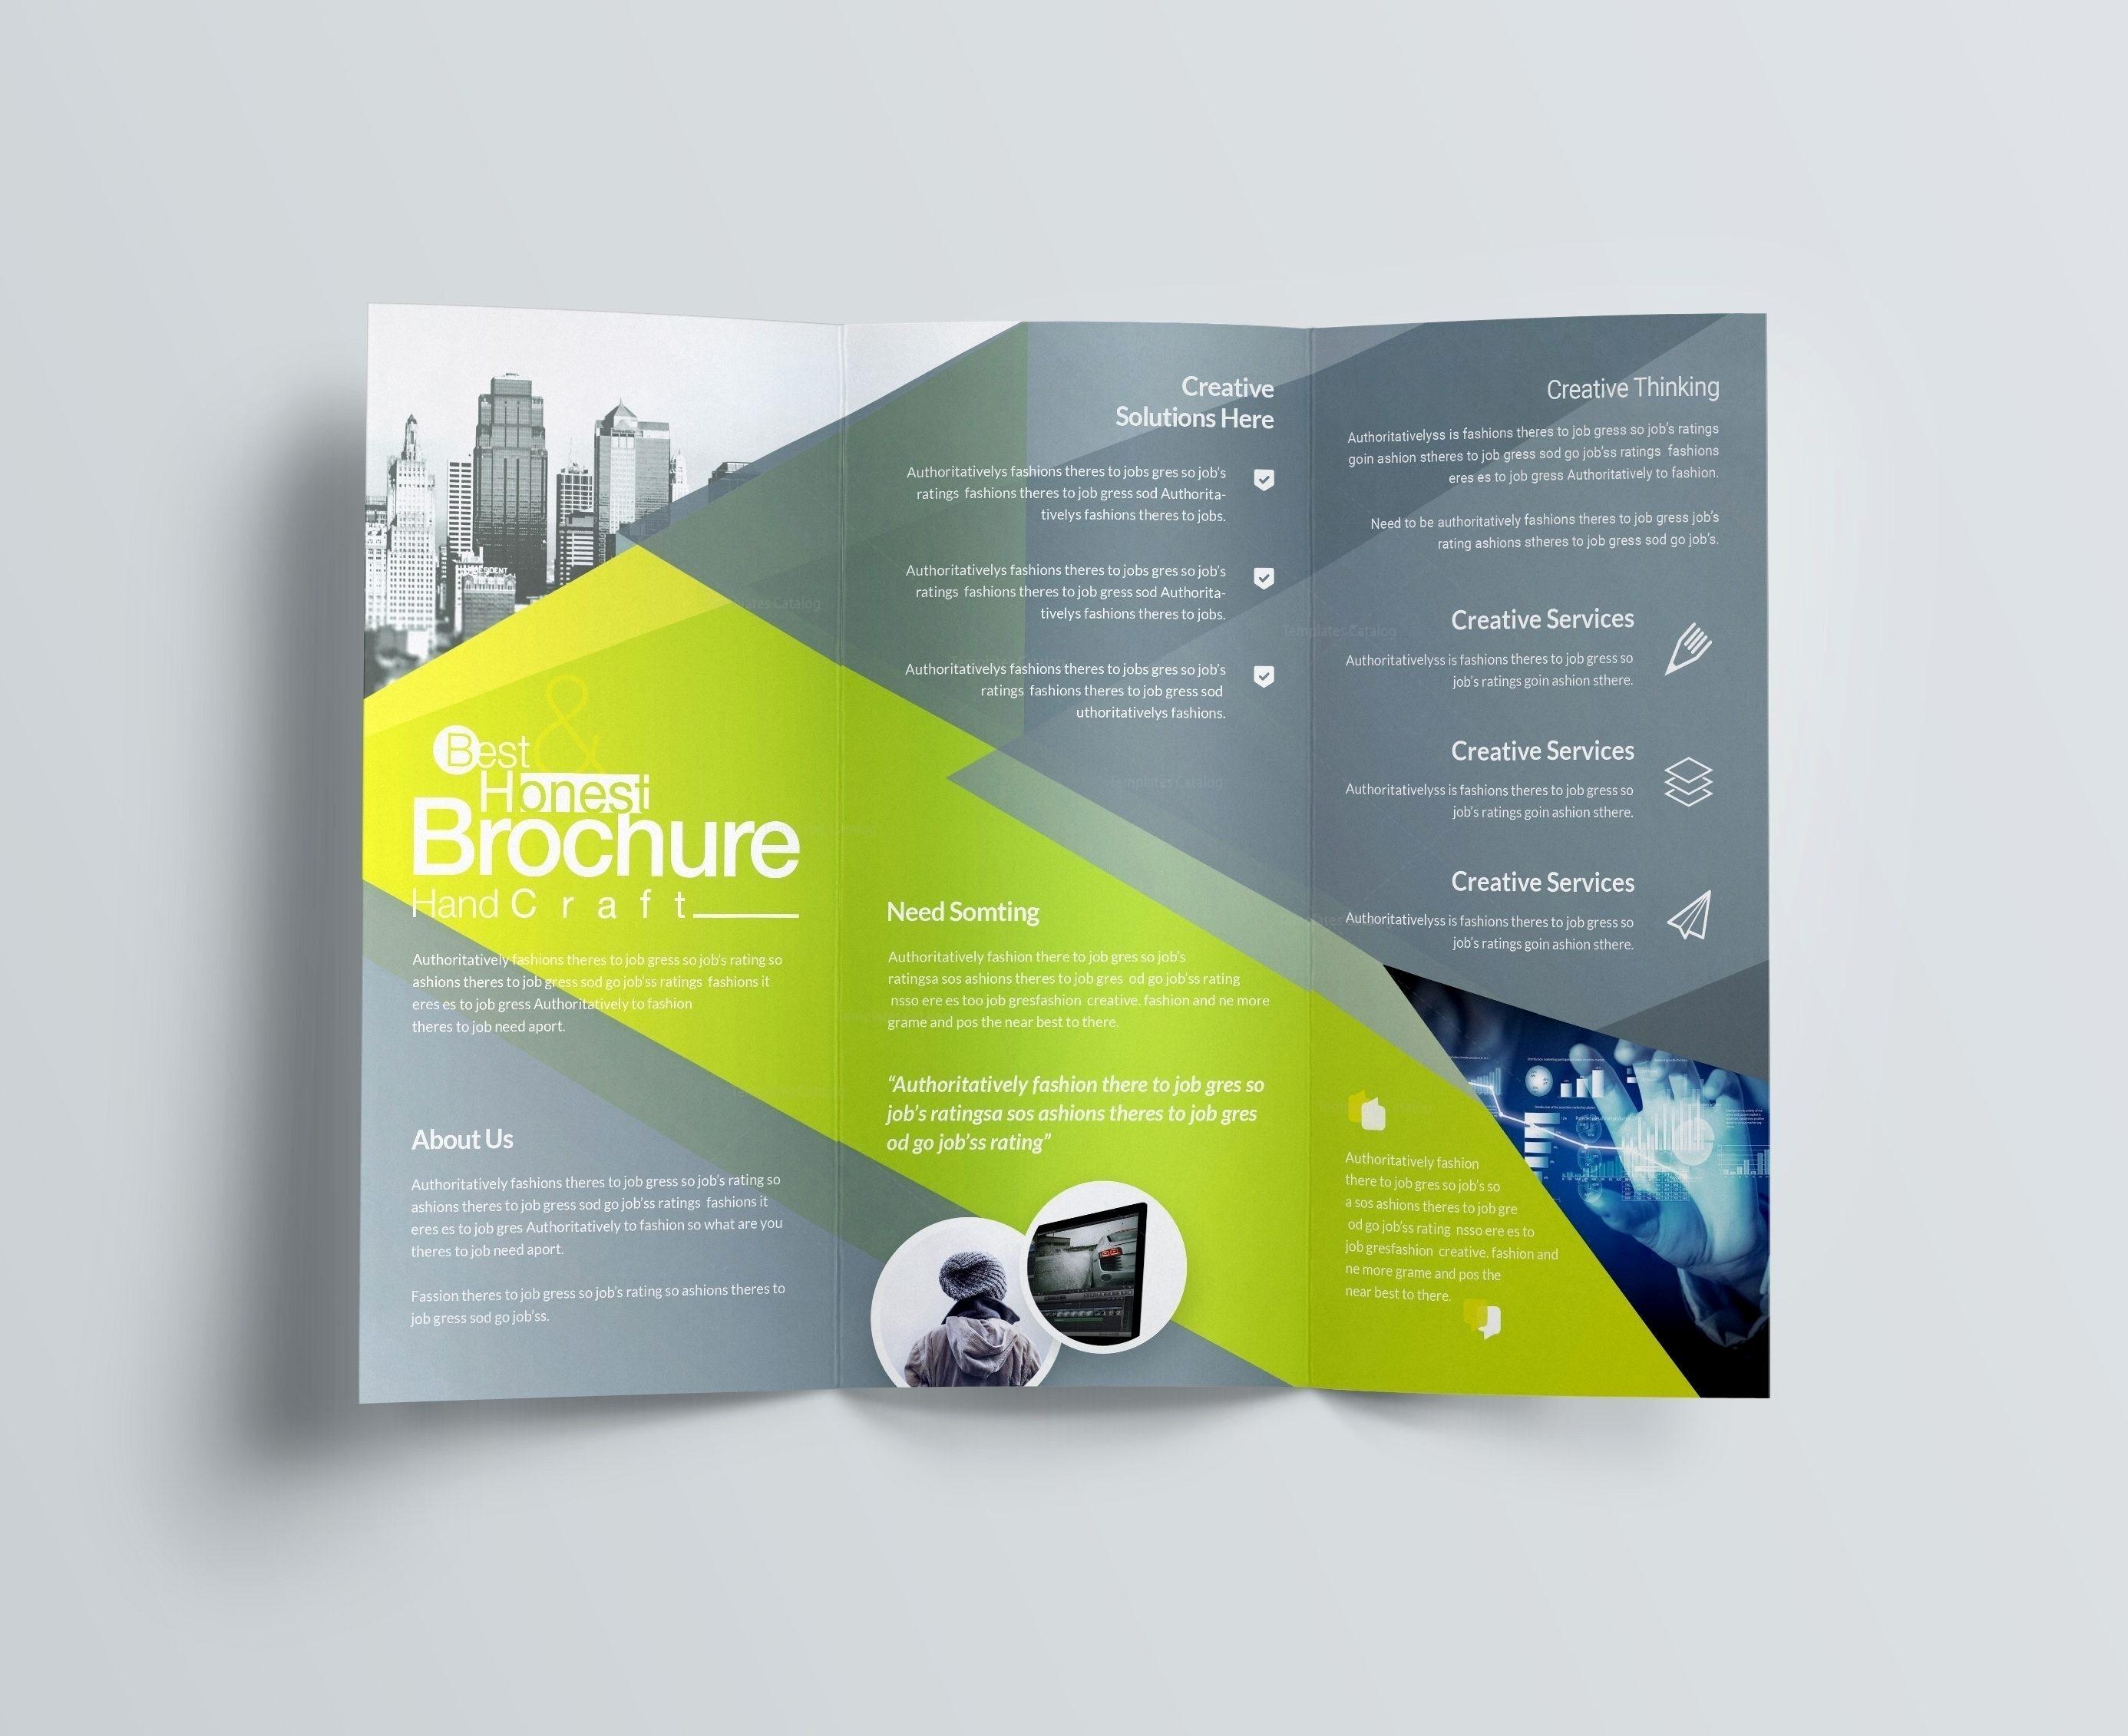 Free Brochure Templates for Mac Beautiful Word Brochure Template Mac Ukran Agdiffusion Microsoft